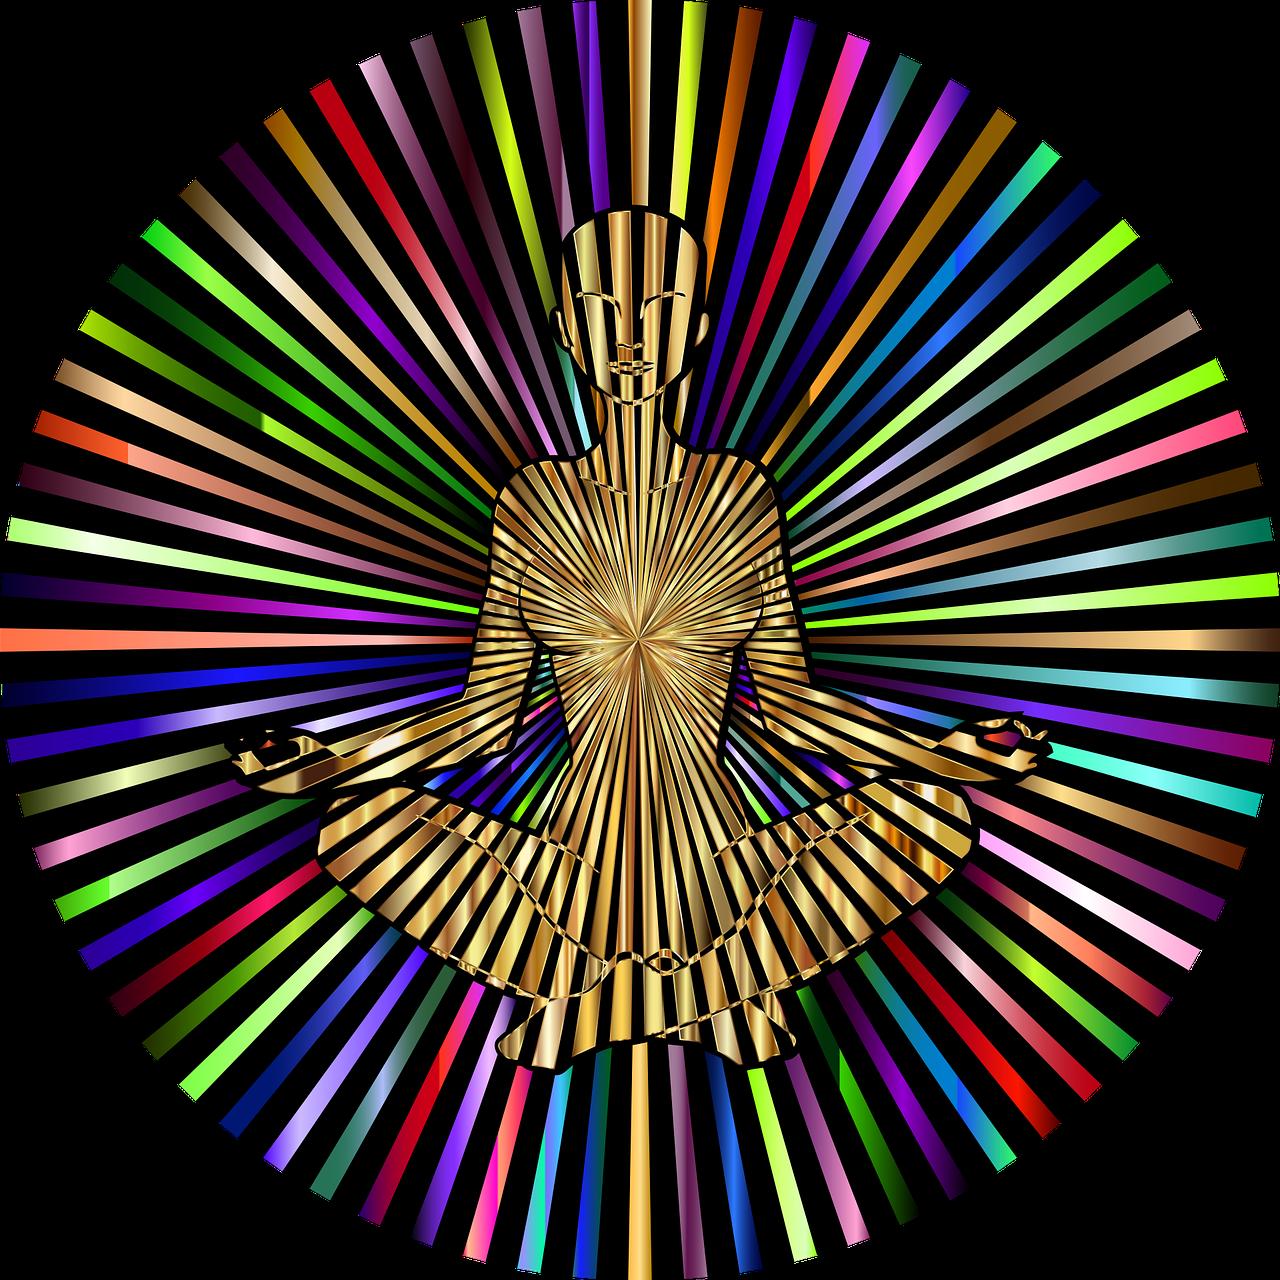 Full Psychic & Tarot Guidance Reading